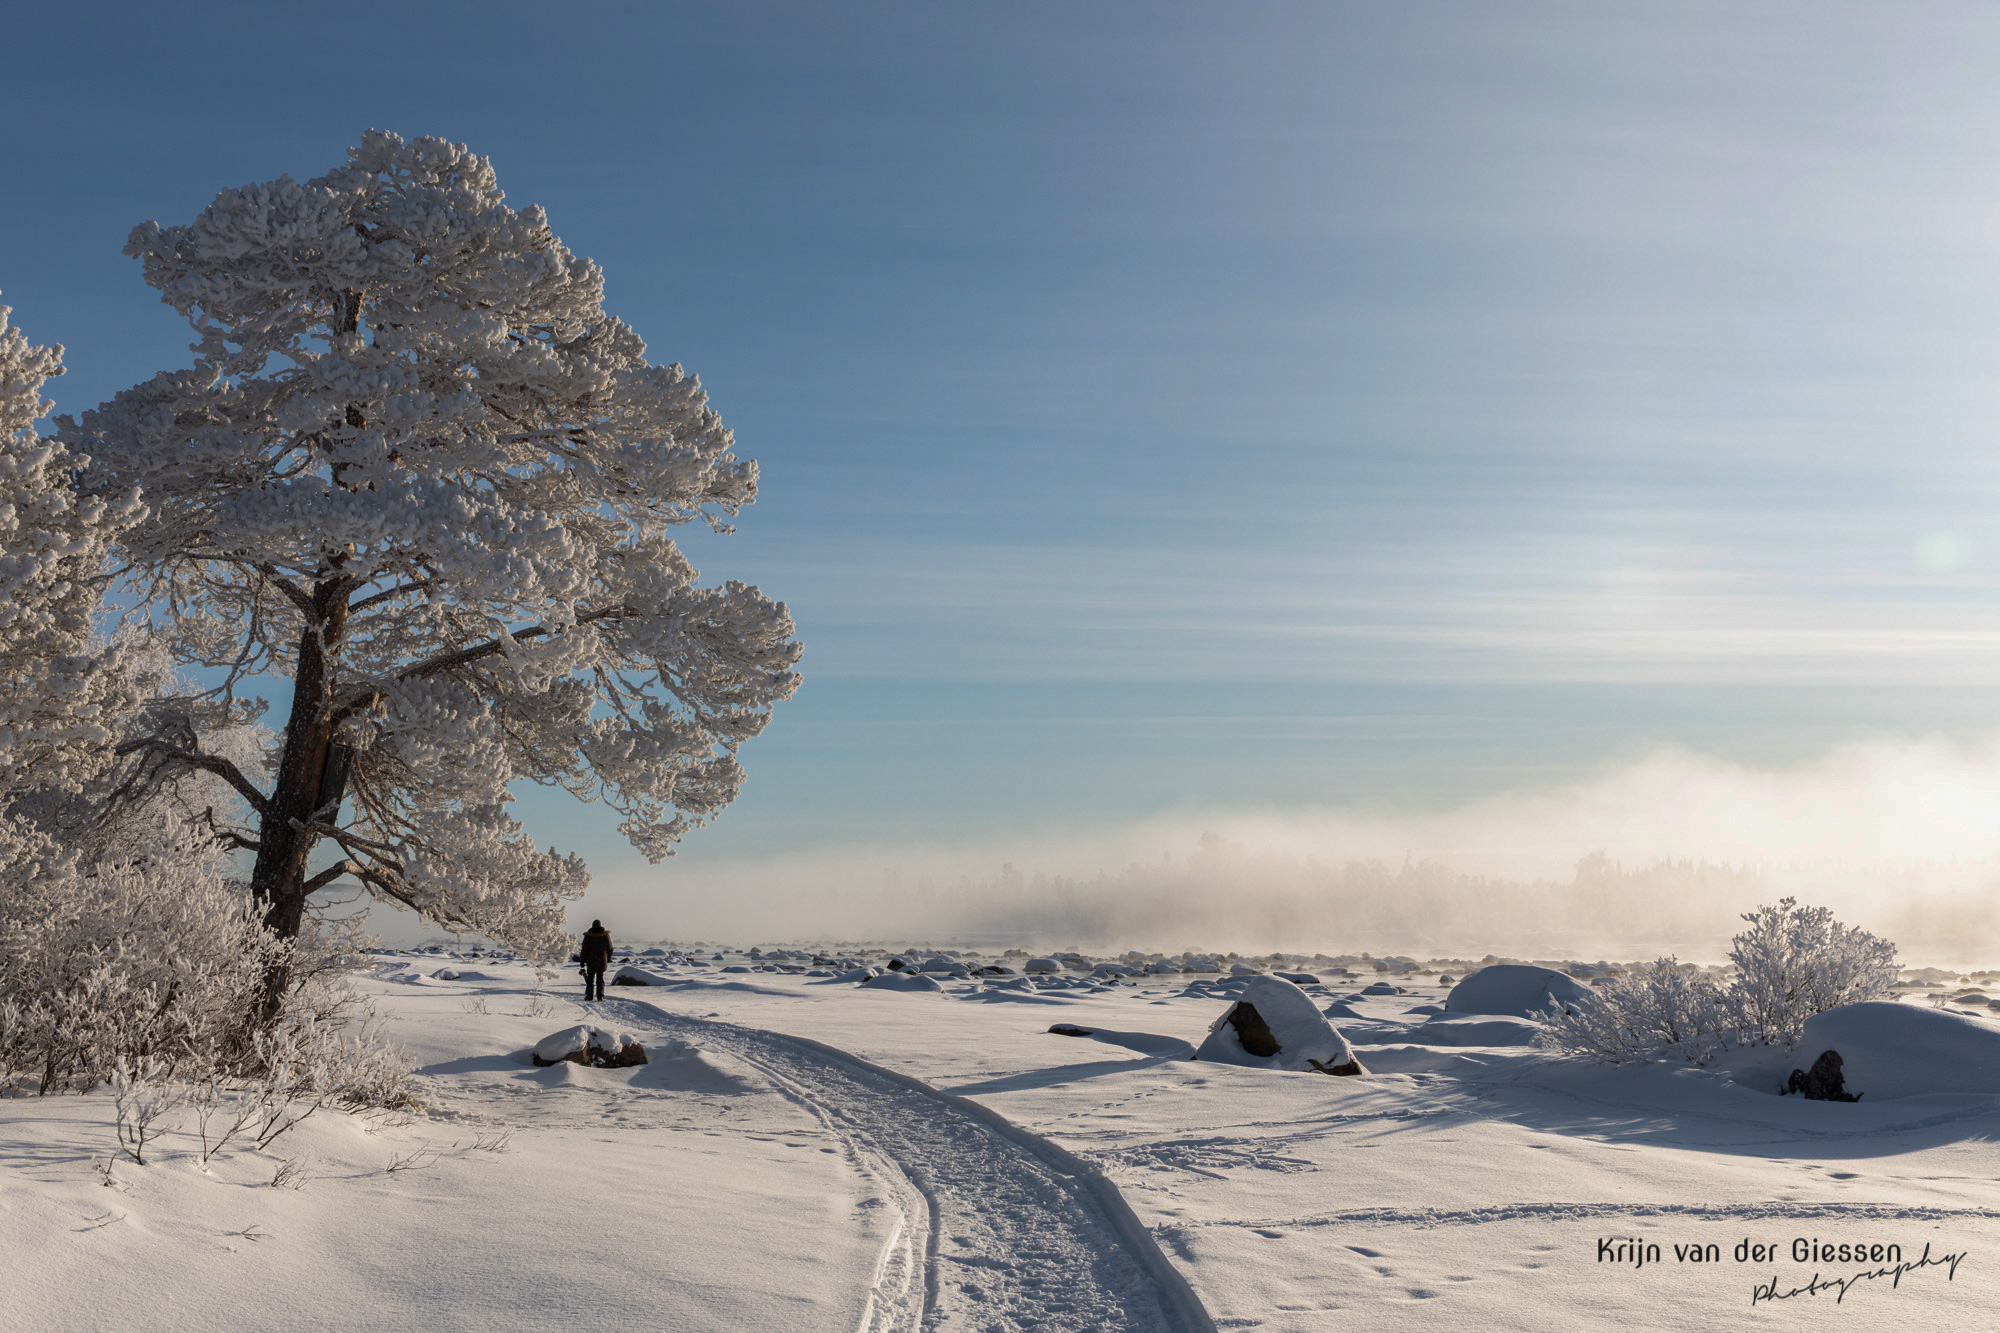 Underexposed snow landscape